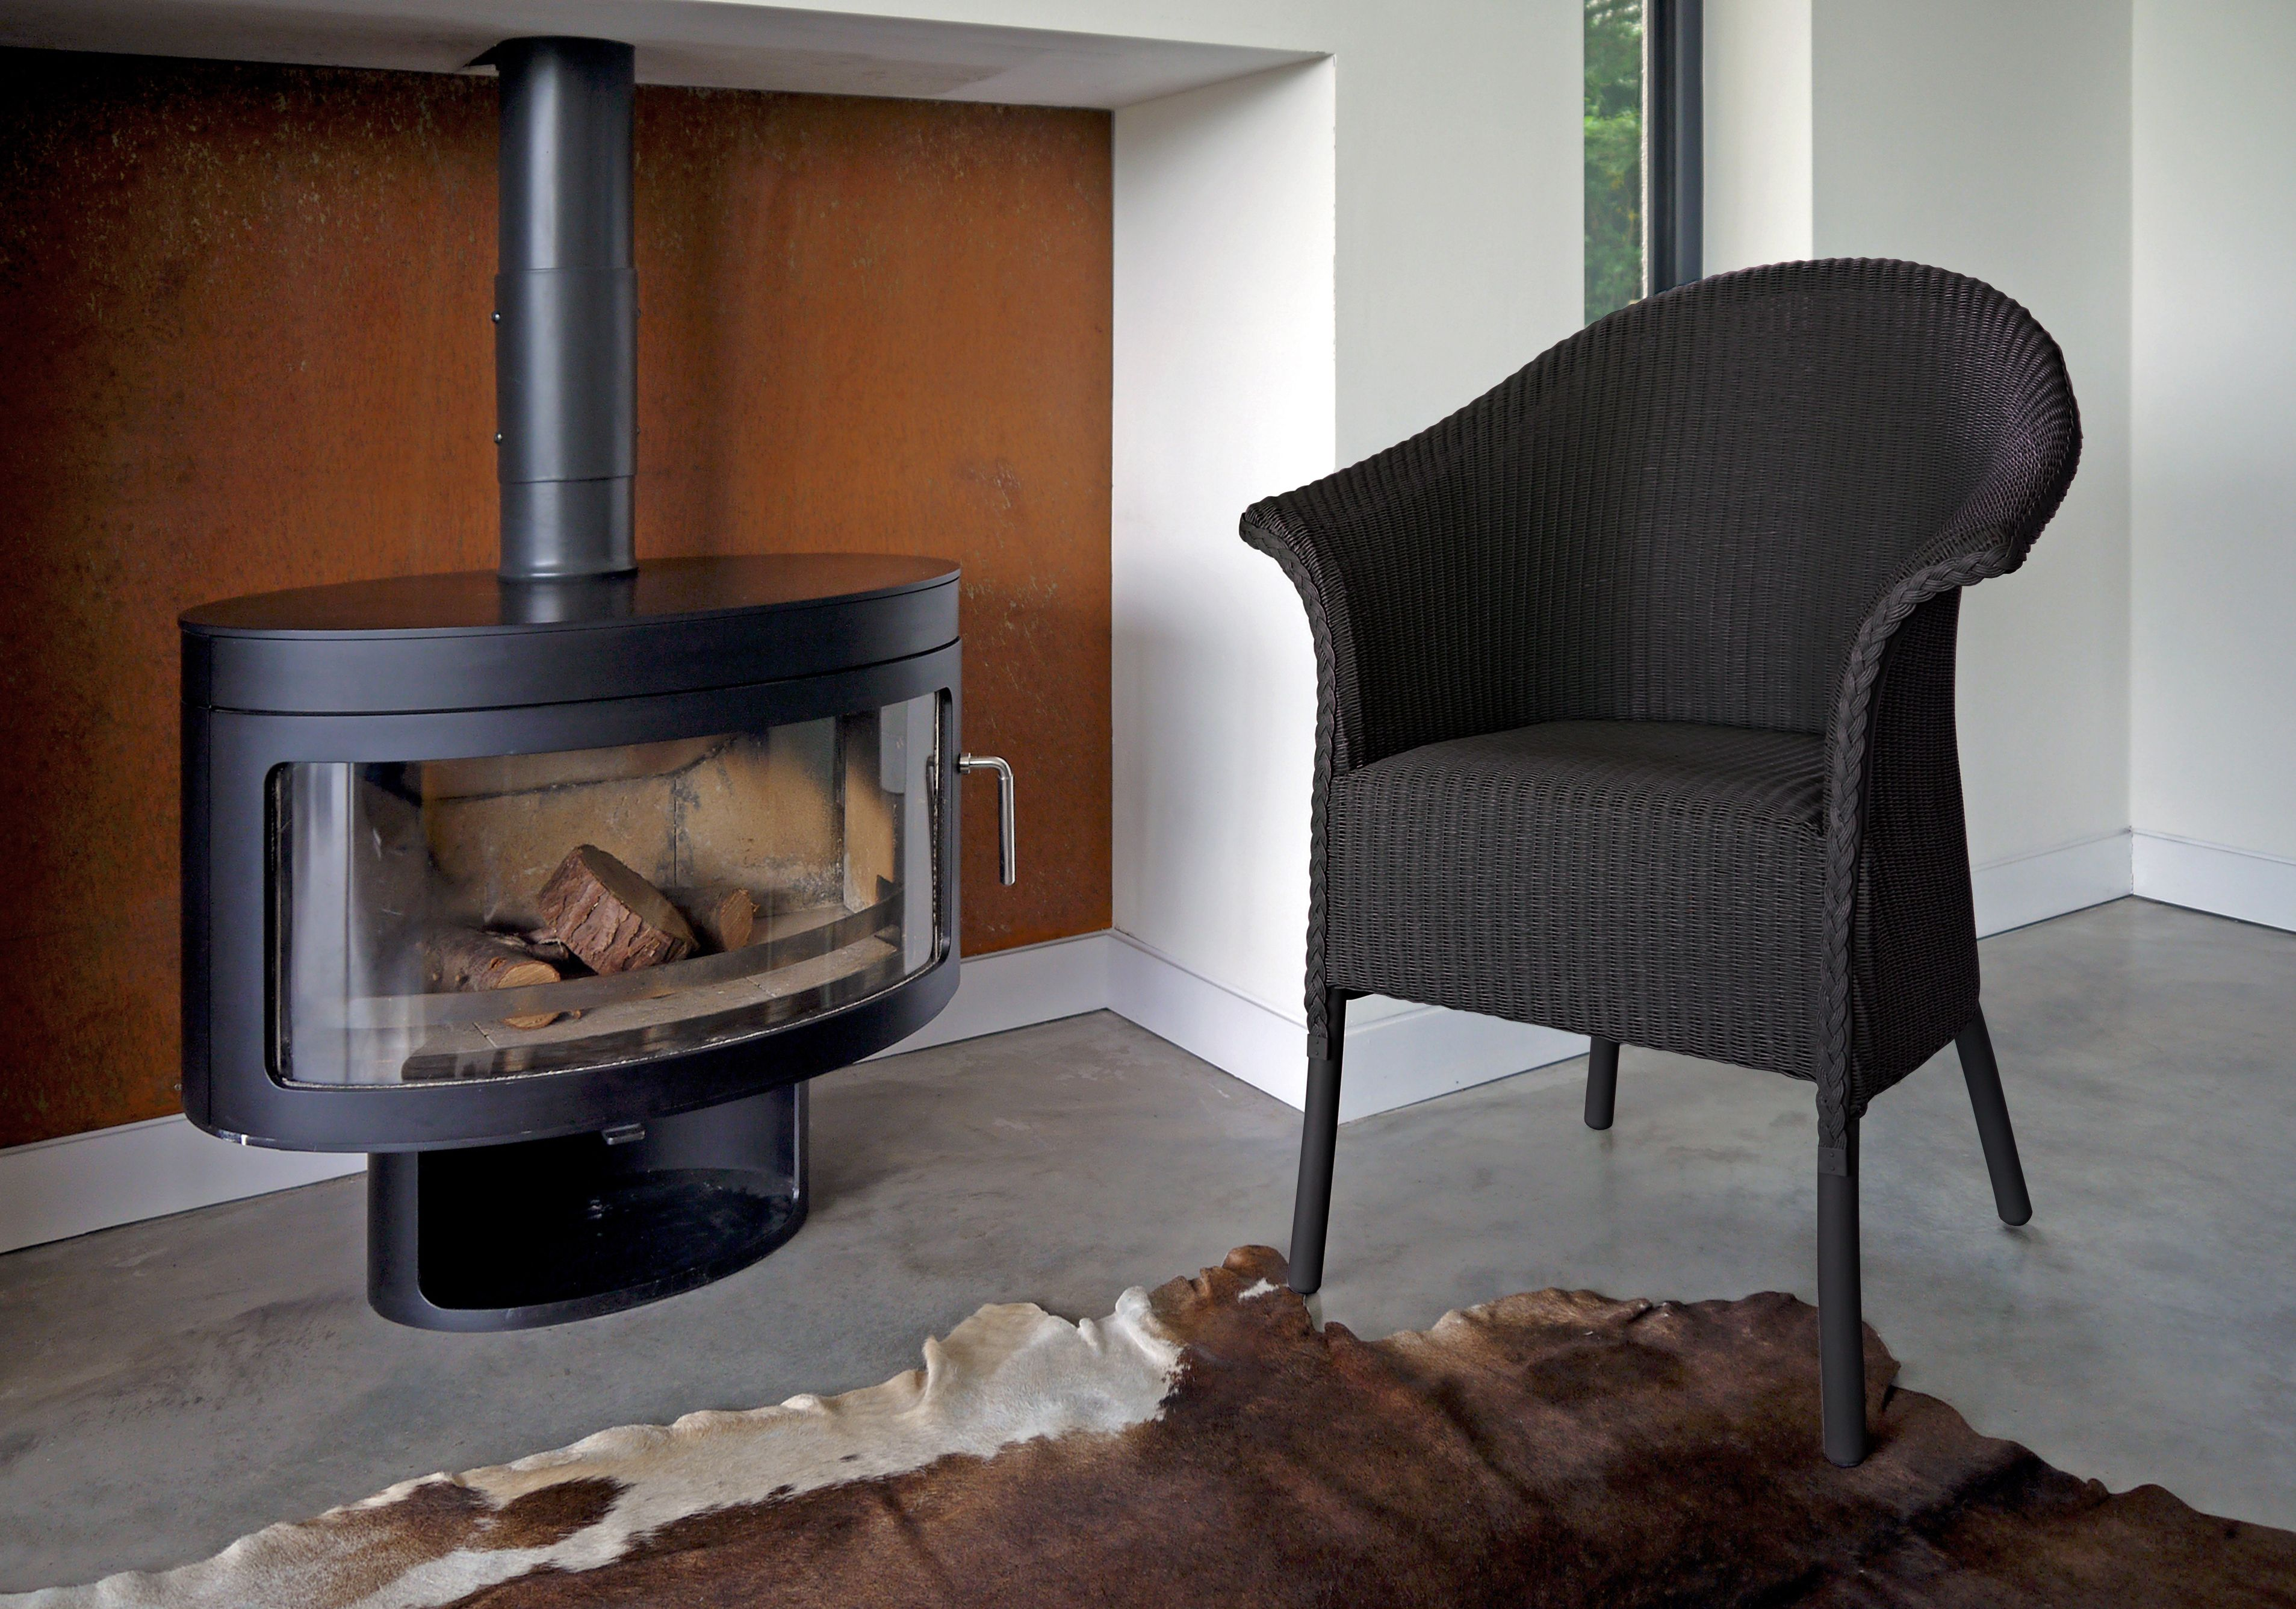 fairmont sofa laura ashley barker and stonehouse cushions lloyd loom armchair furniture from treske